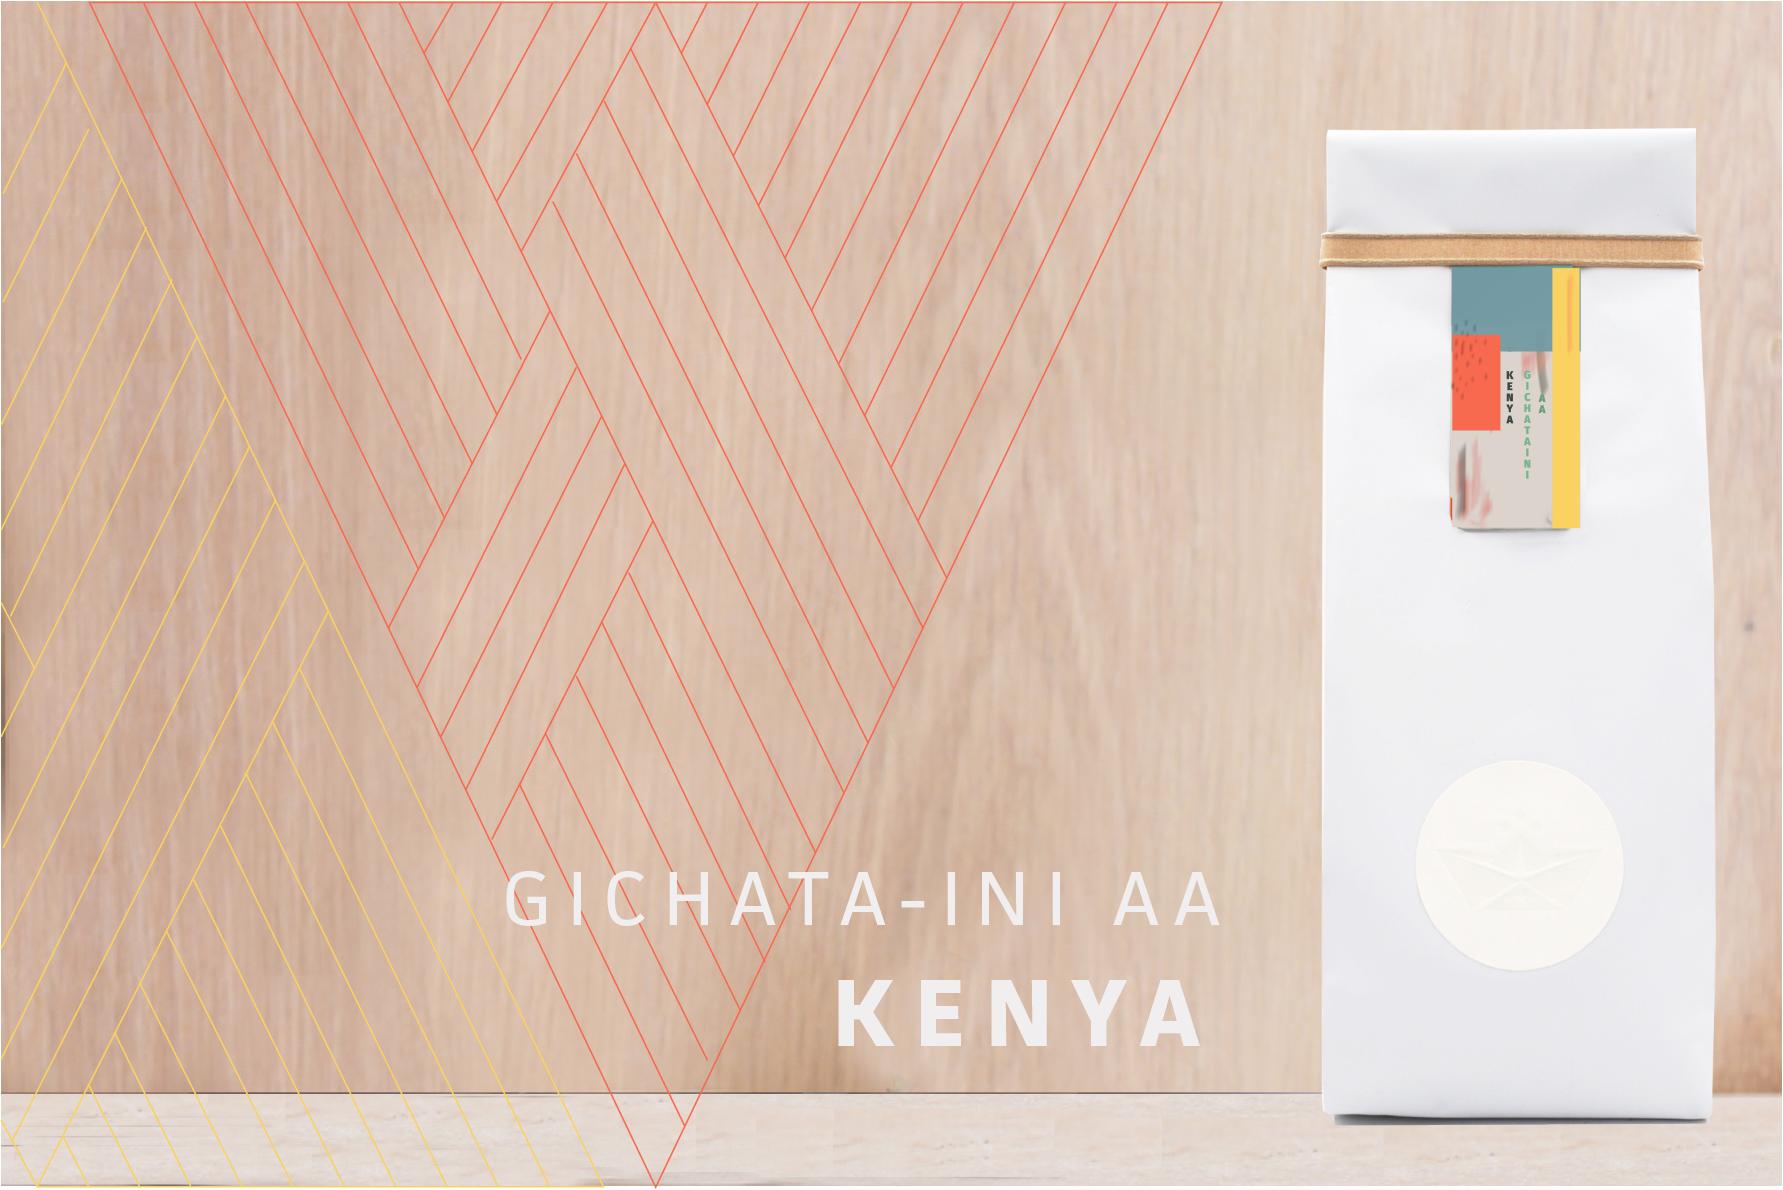 Kenya Gichata-Ini AA